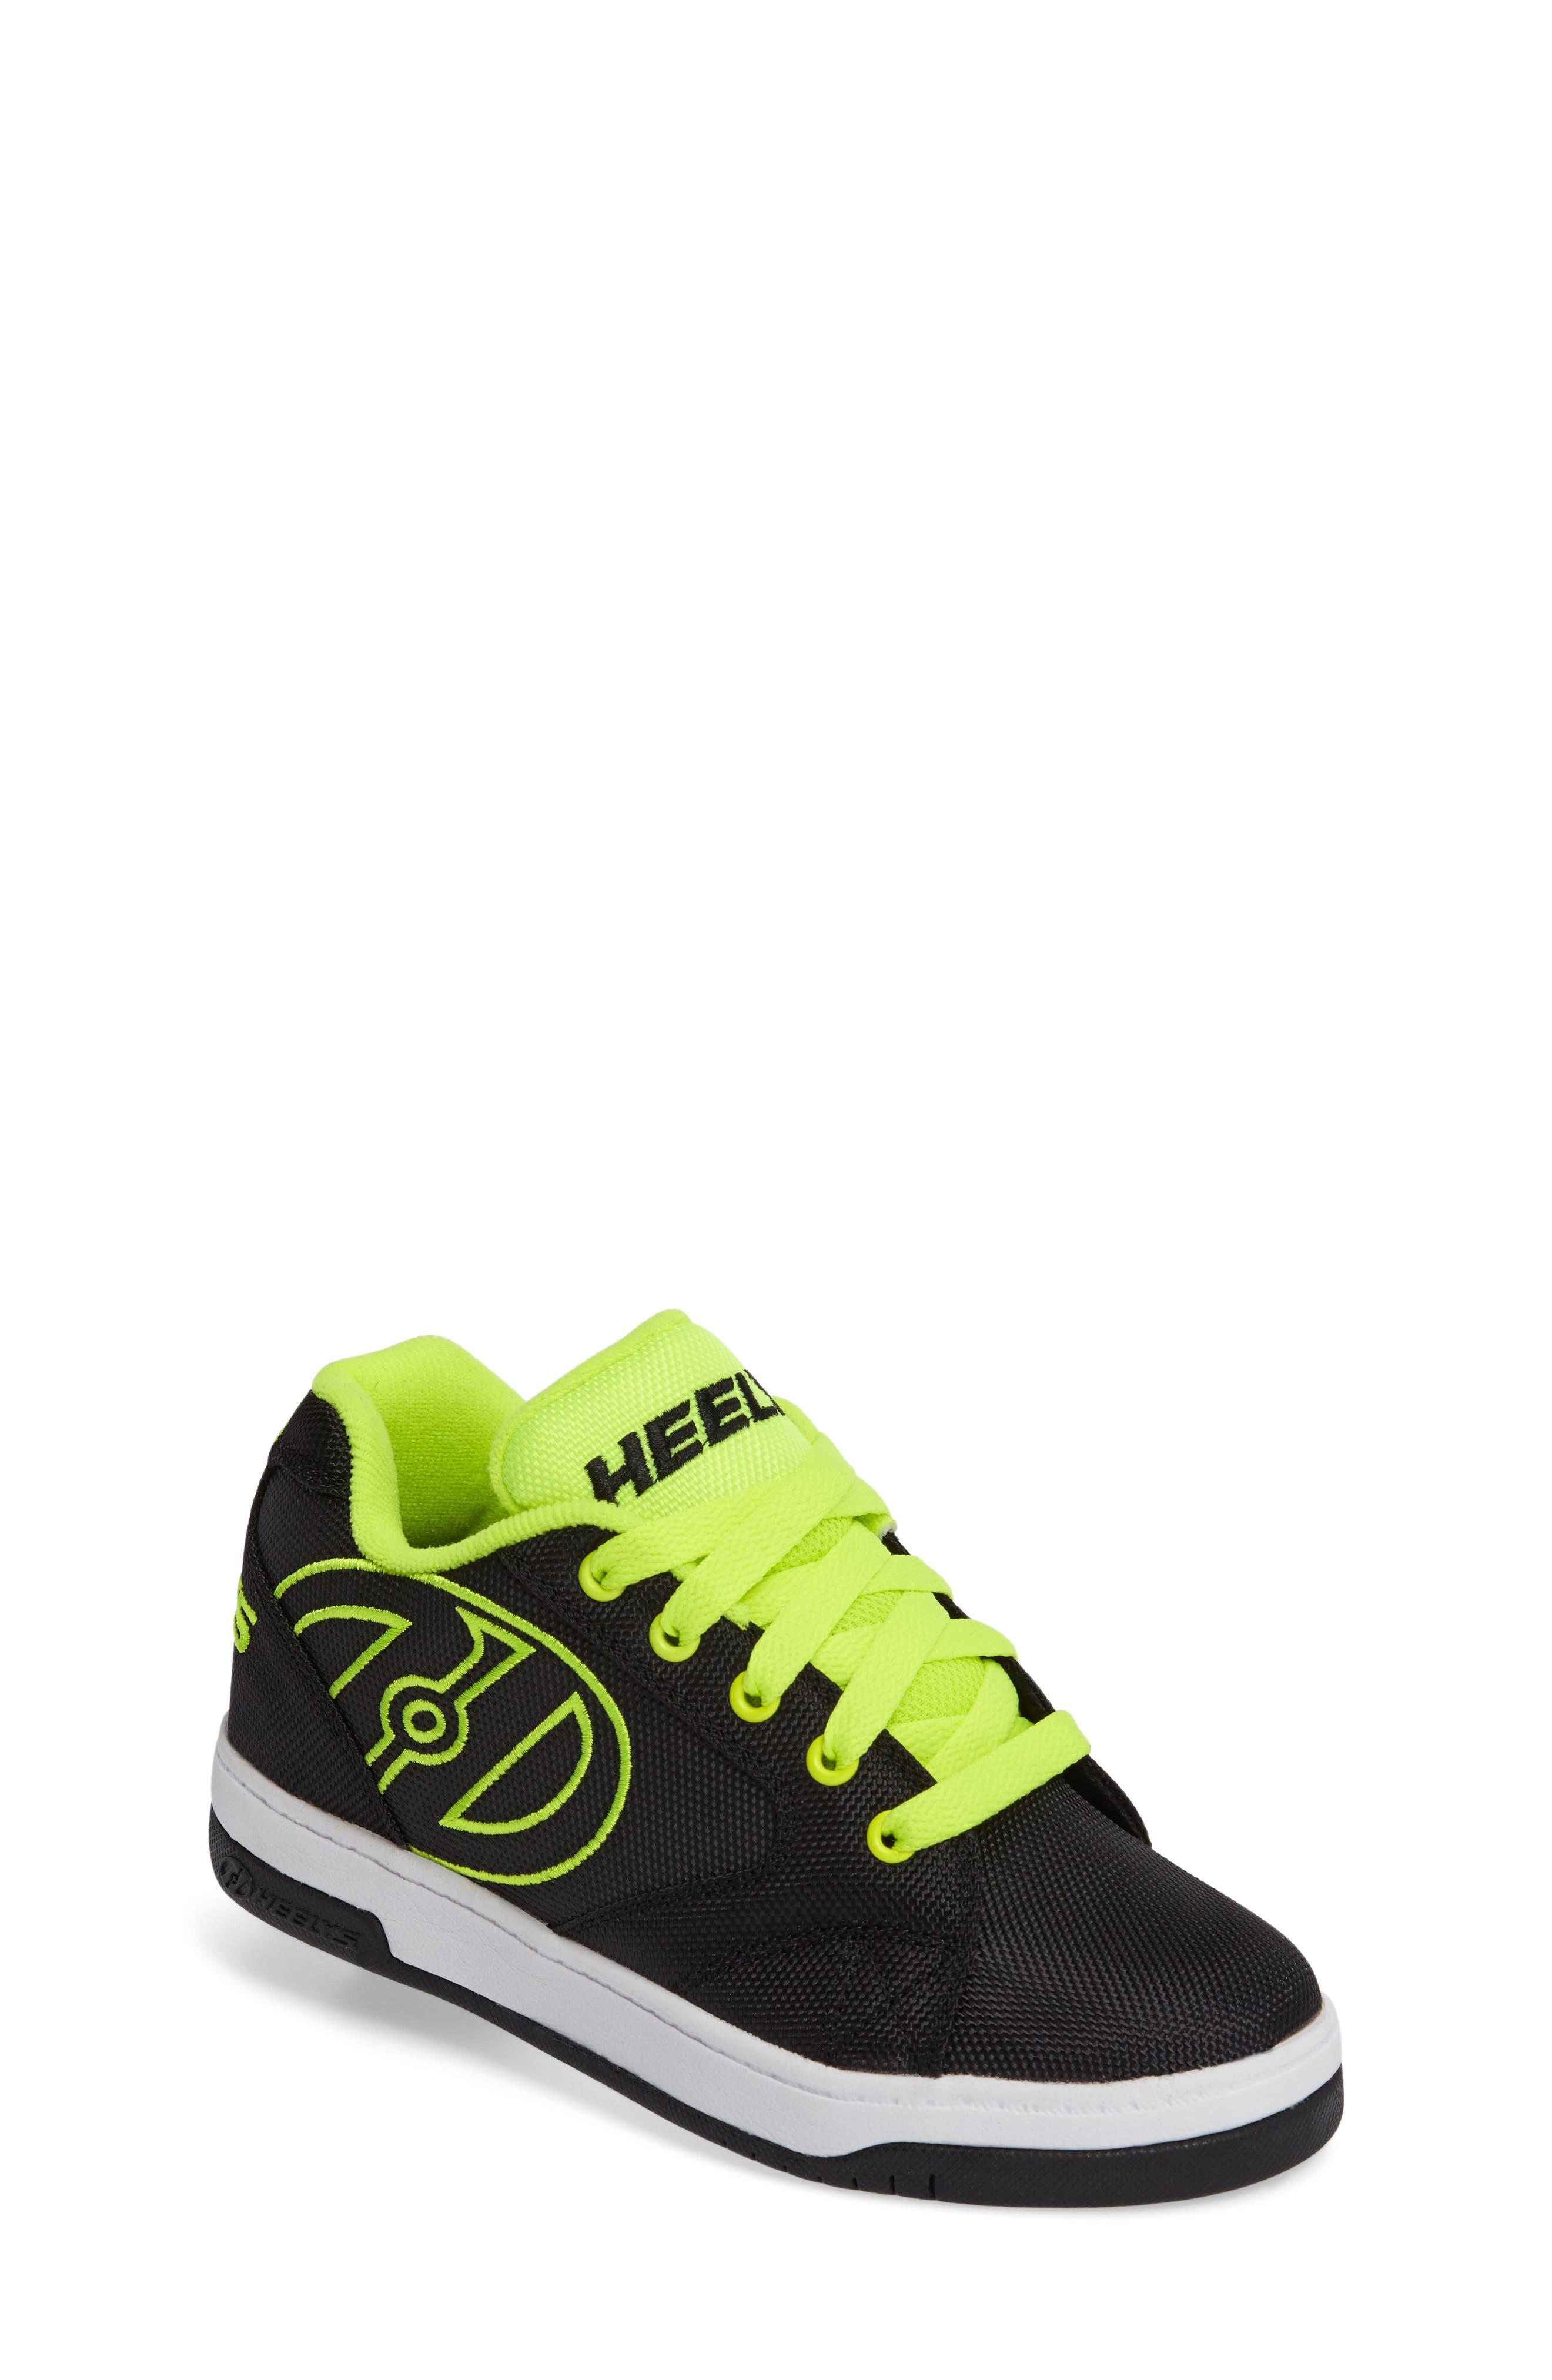 HEELYS 'Propel 2.0' Wheeled Sneaker, Main, color, 018